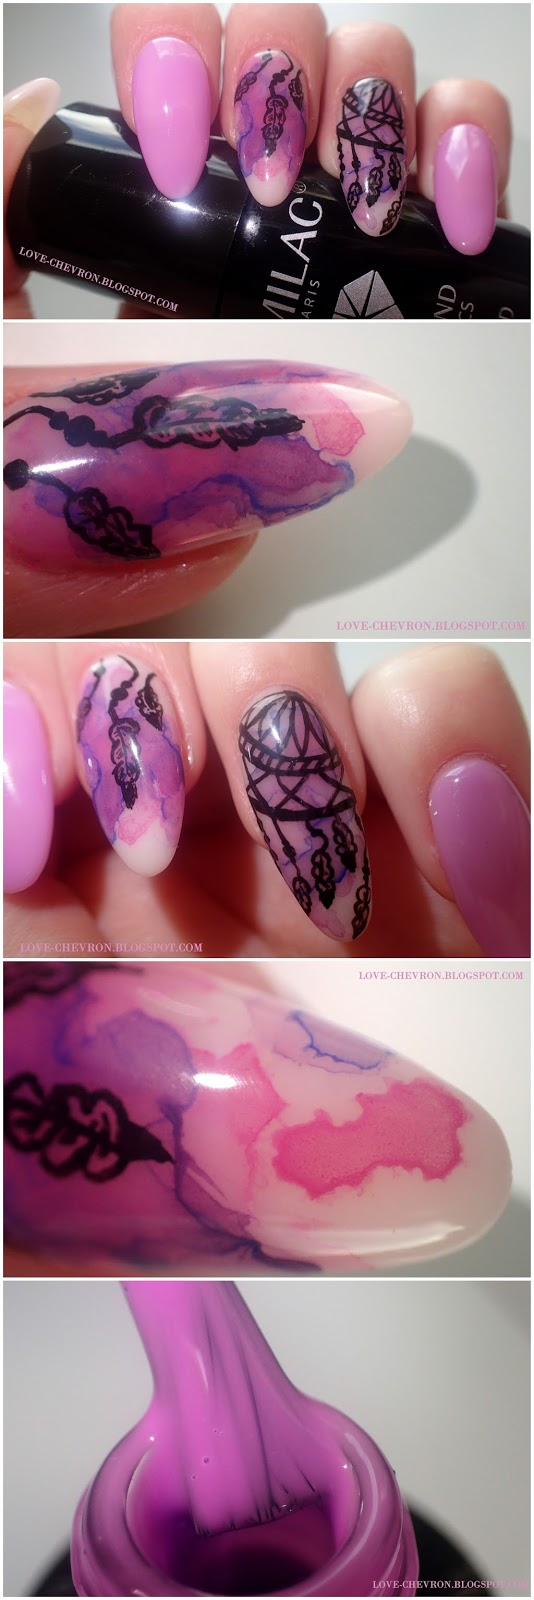 blur effect nails dreamcatcher, łapacz snów